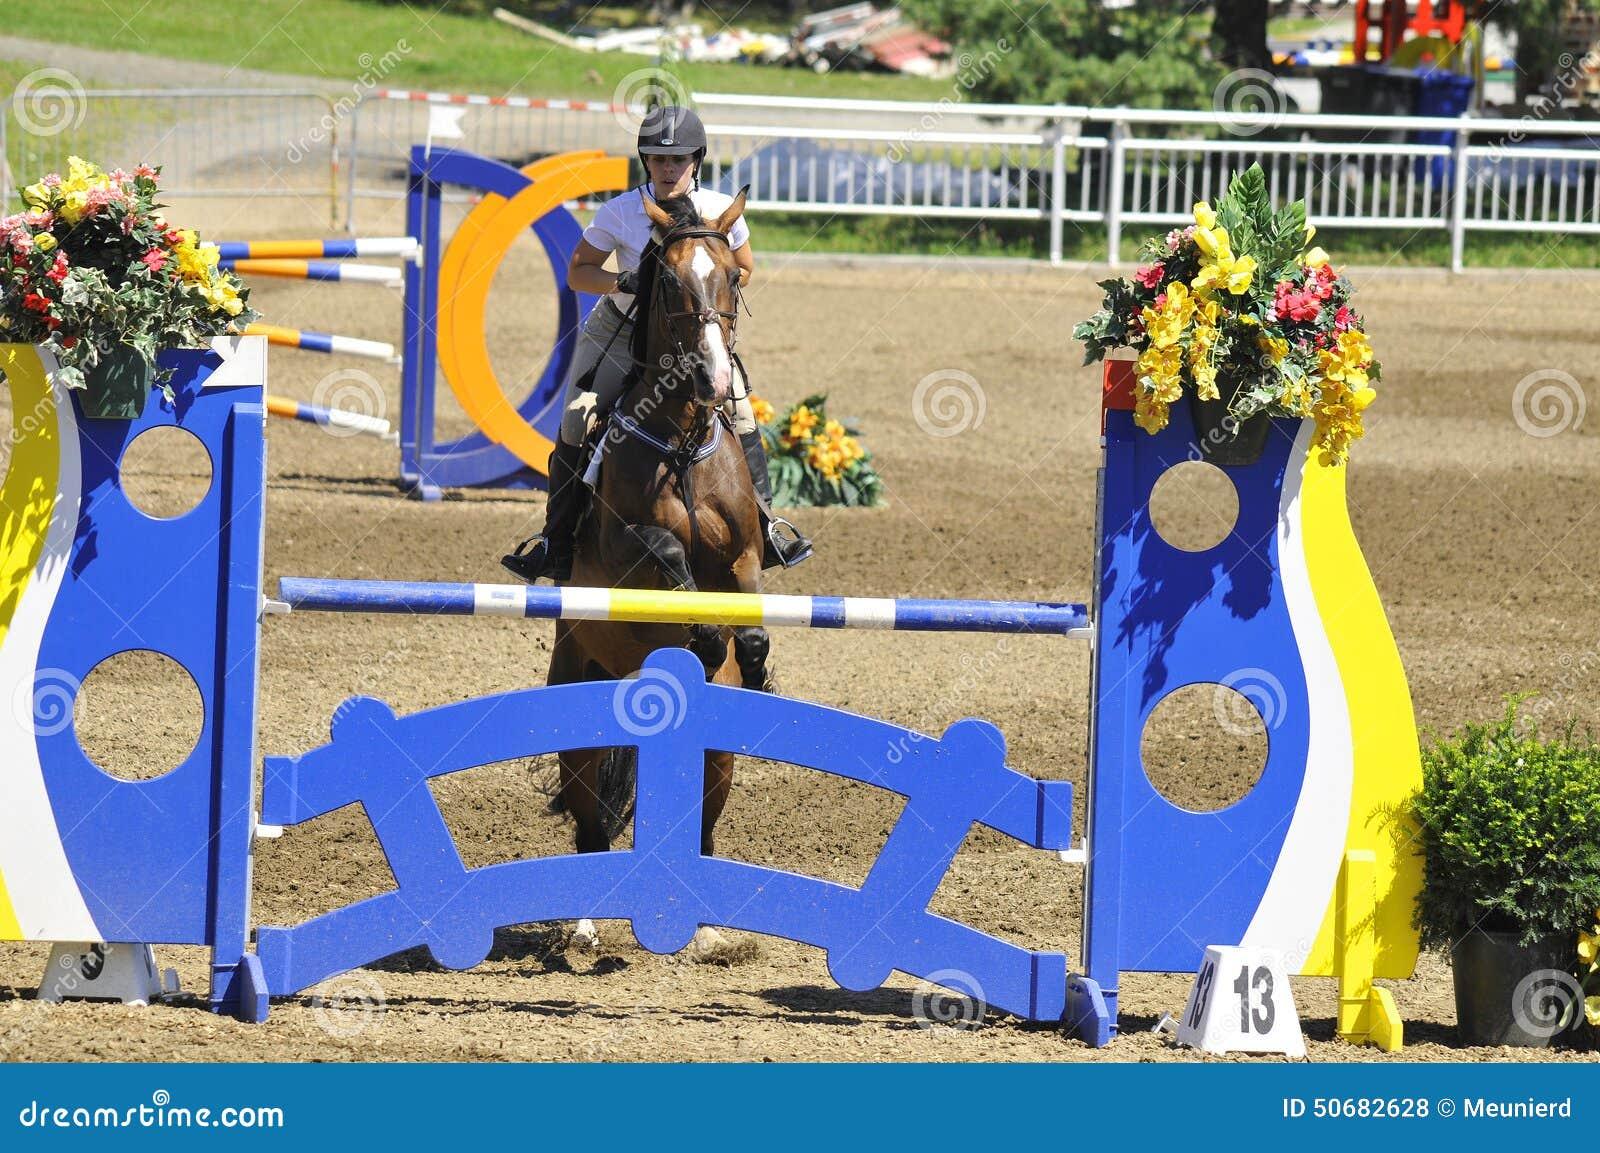 Download 国际BROMONT 编辑类库存照片. 图片 包括有 蒙特利尔, 飞跃, 疾驰, 骑马, 活动, 母马, 御马者 - 50682628